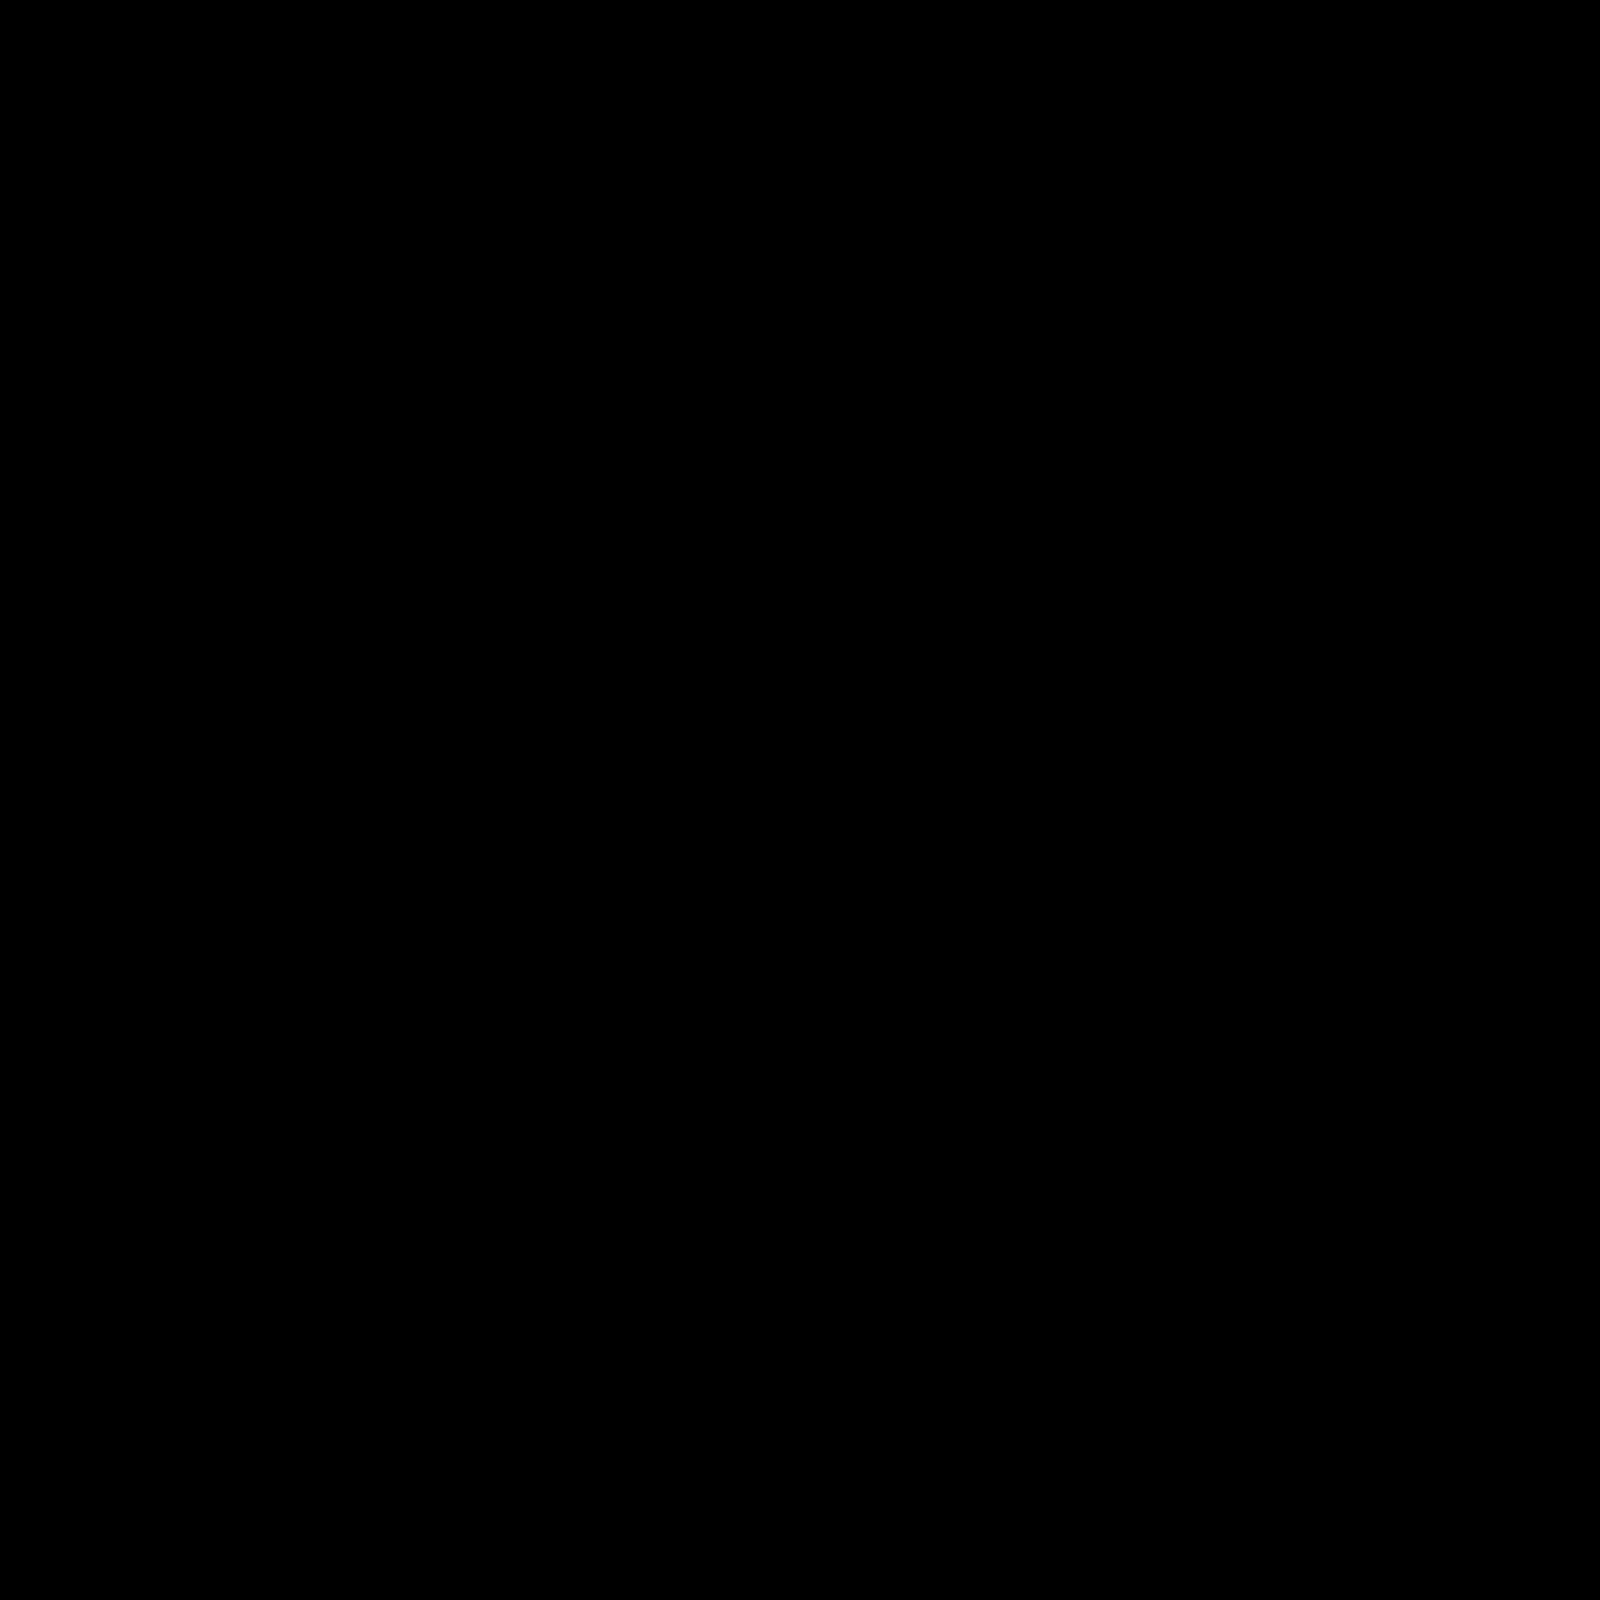 Fedora Filled icon